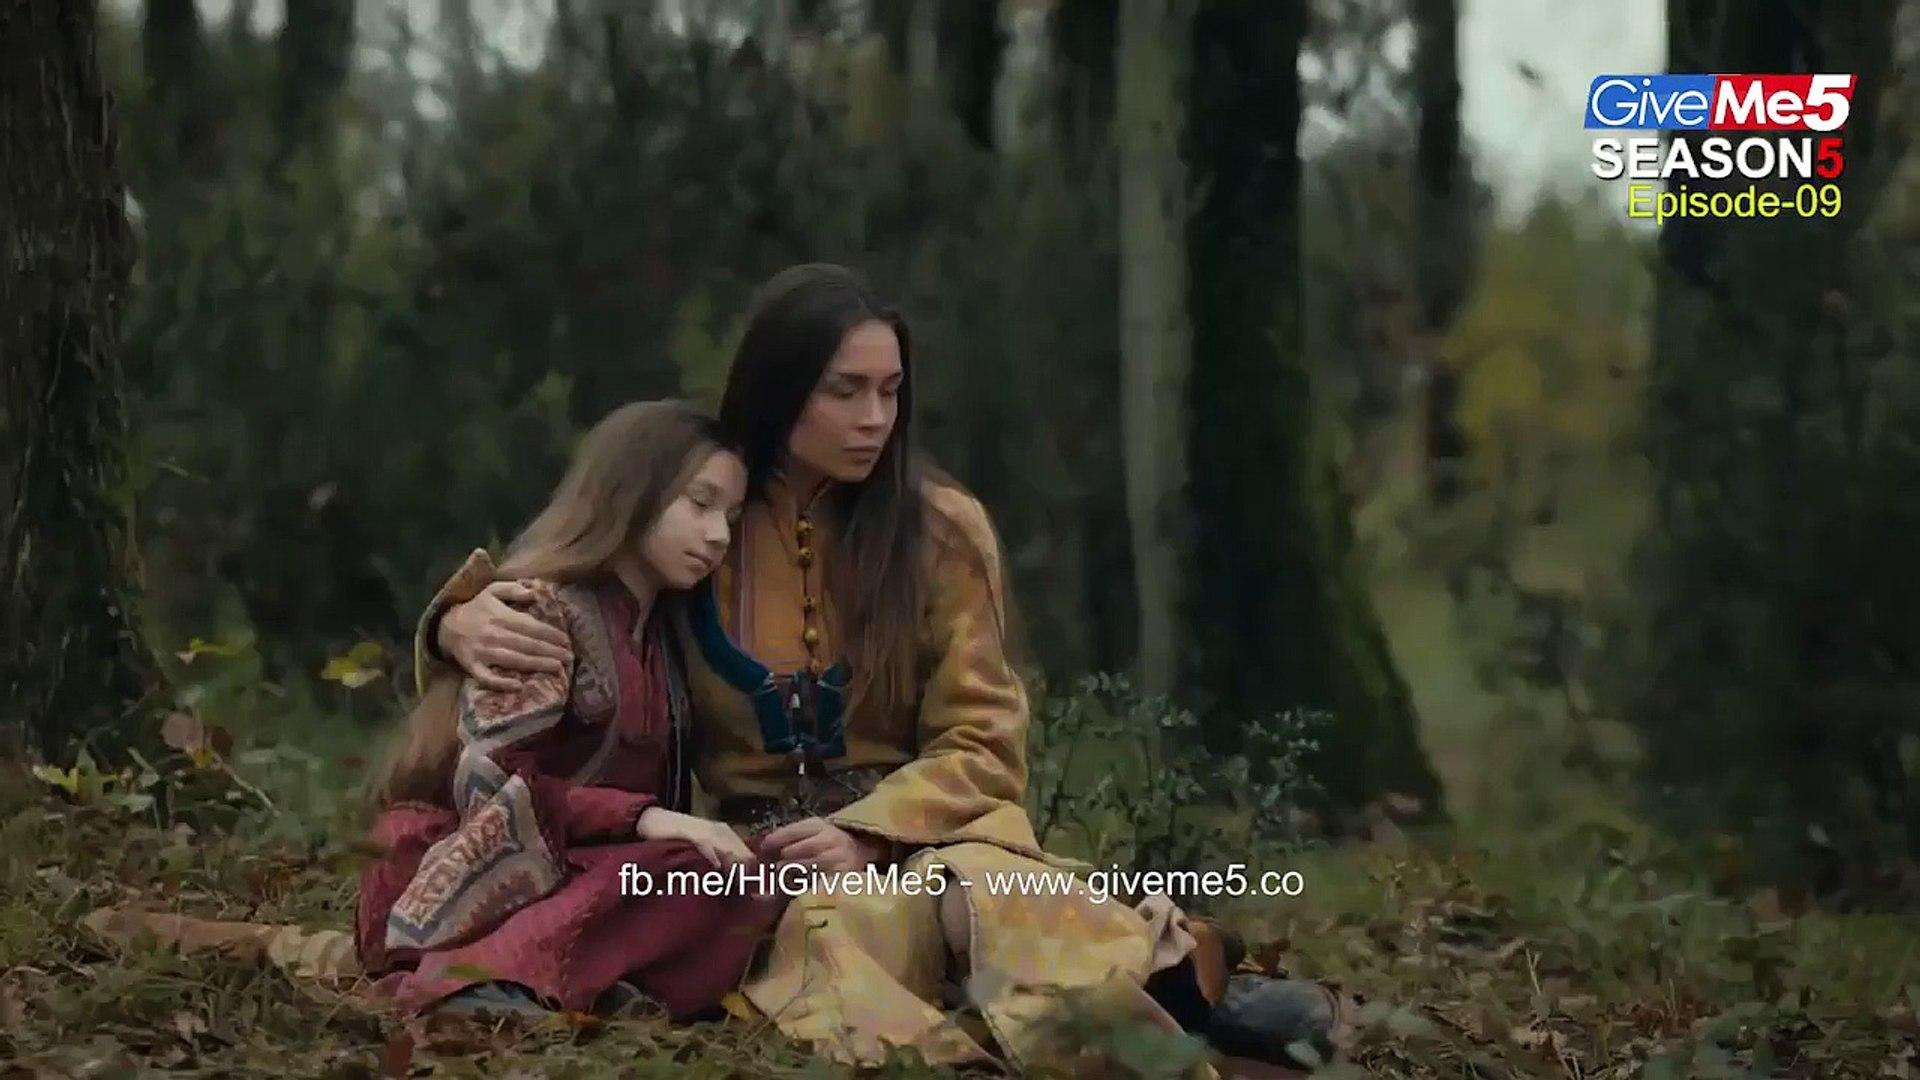 Dirilis Ertugrul Ghazi Season 5 in Urdu Subtitle Episode 9 & 10